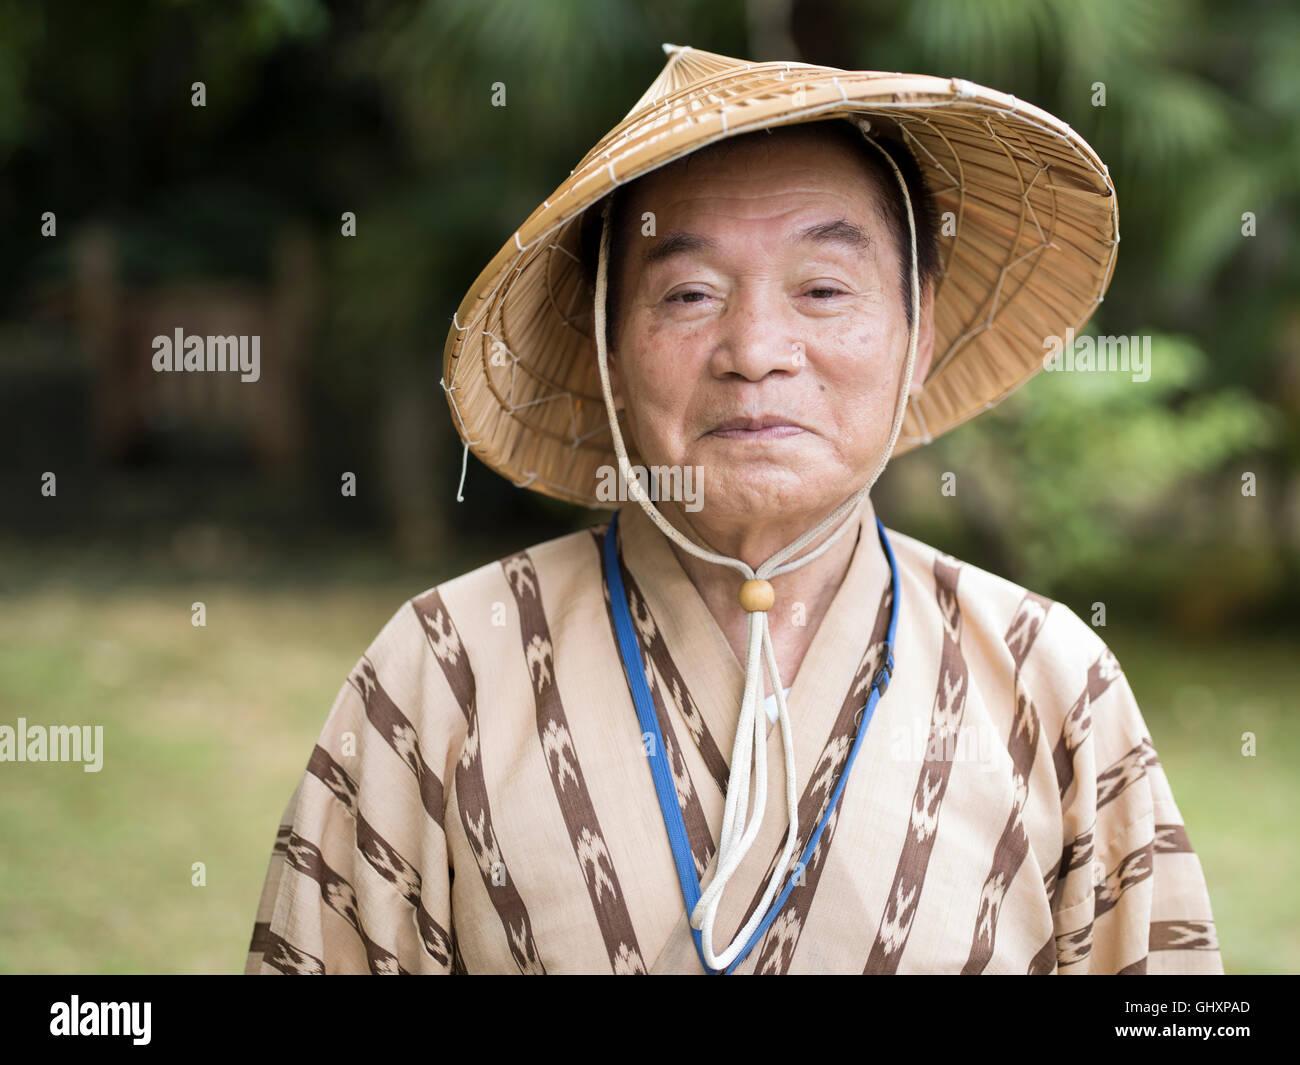 Elderly Okinawan man in his 70's wearing traditional bashofu style kimono and straw hat. Okinawa is a longevity - Stock Image